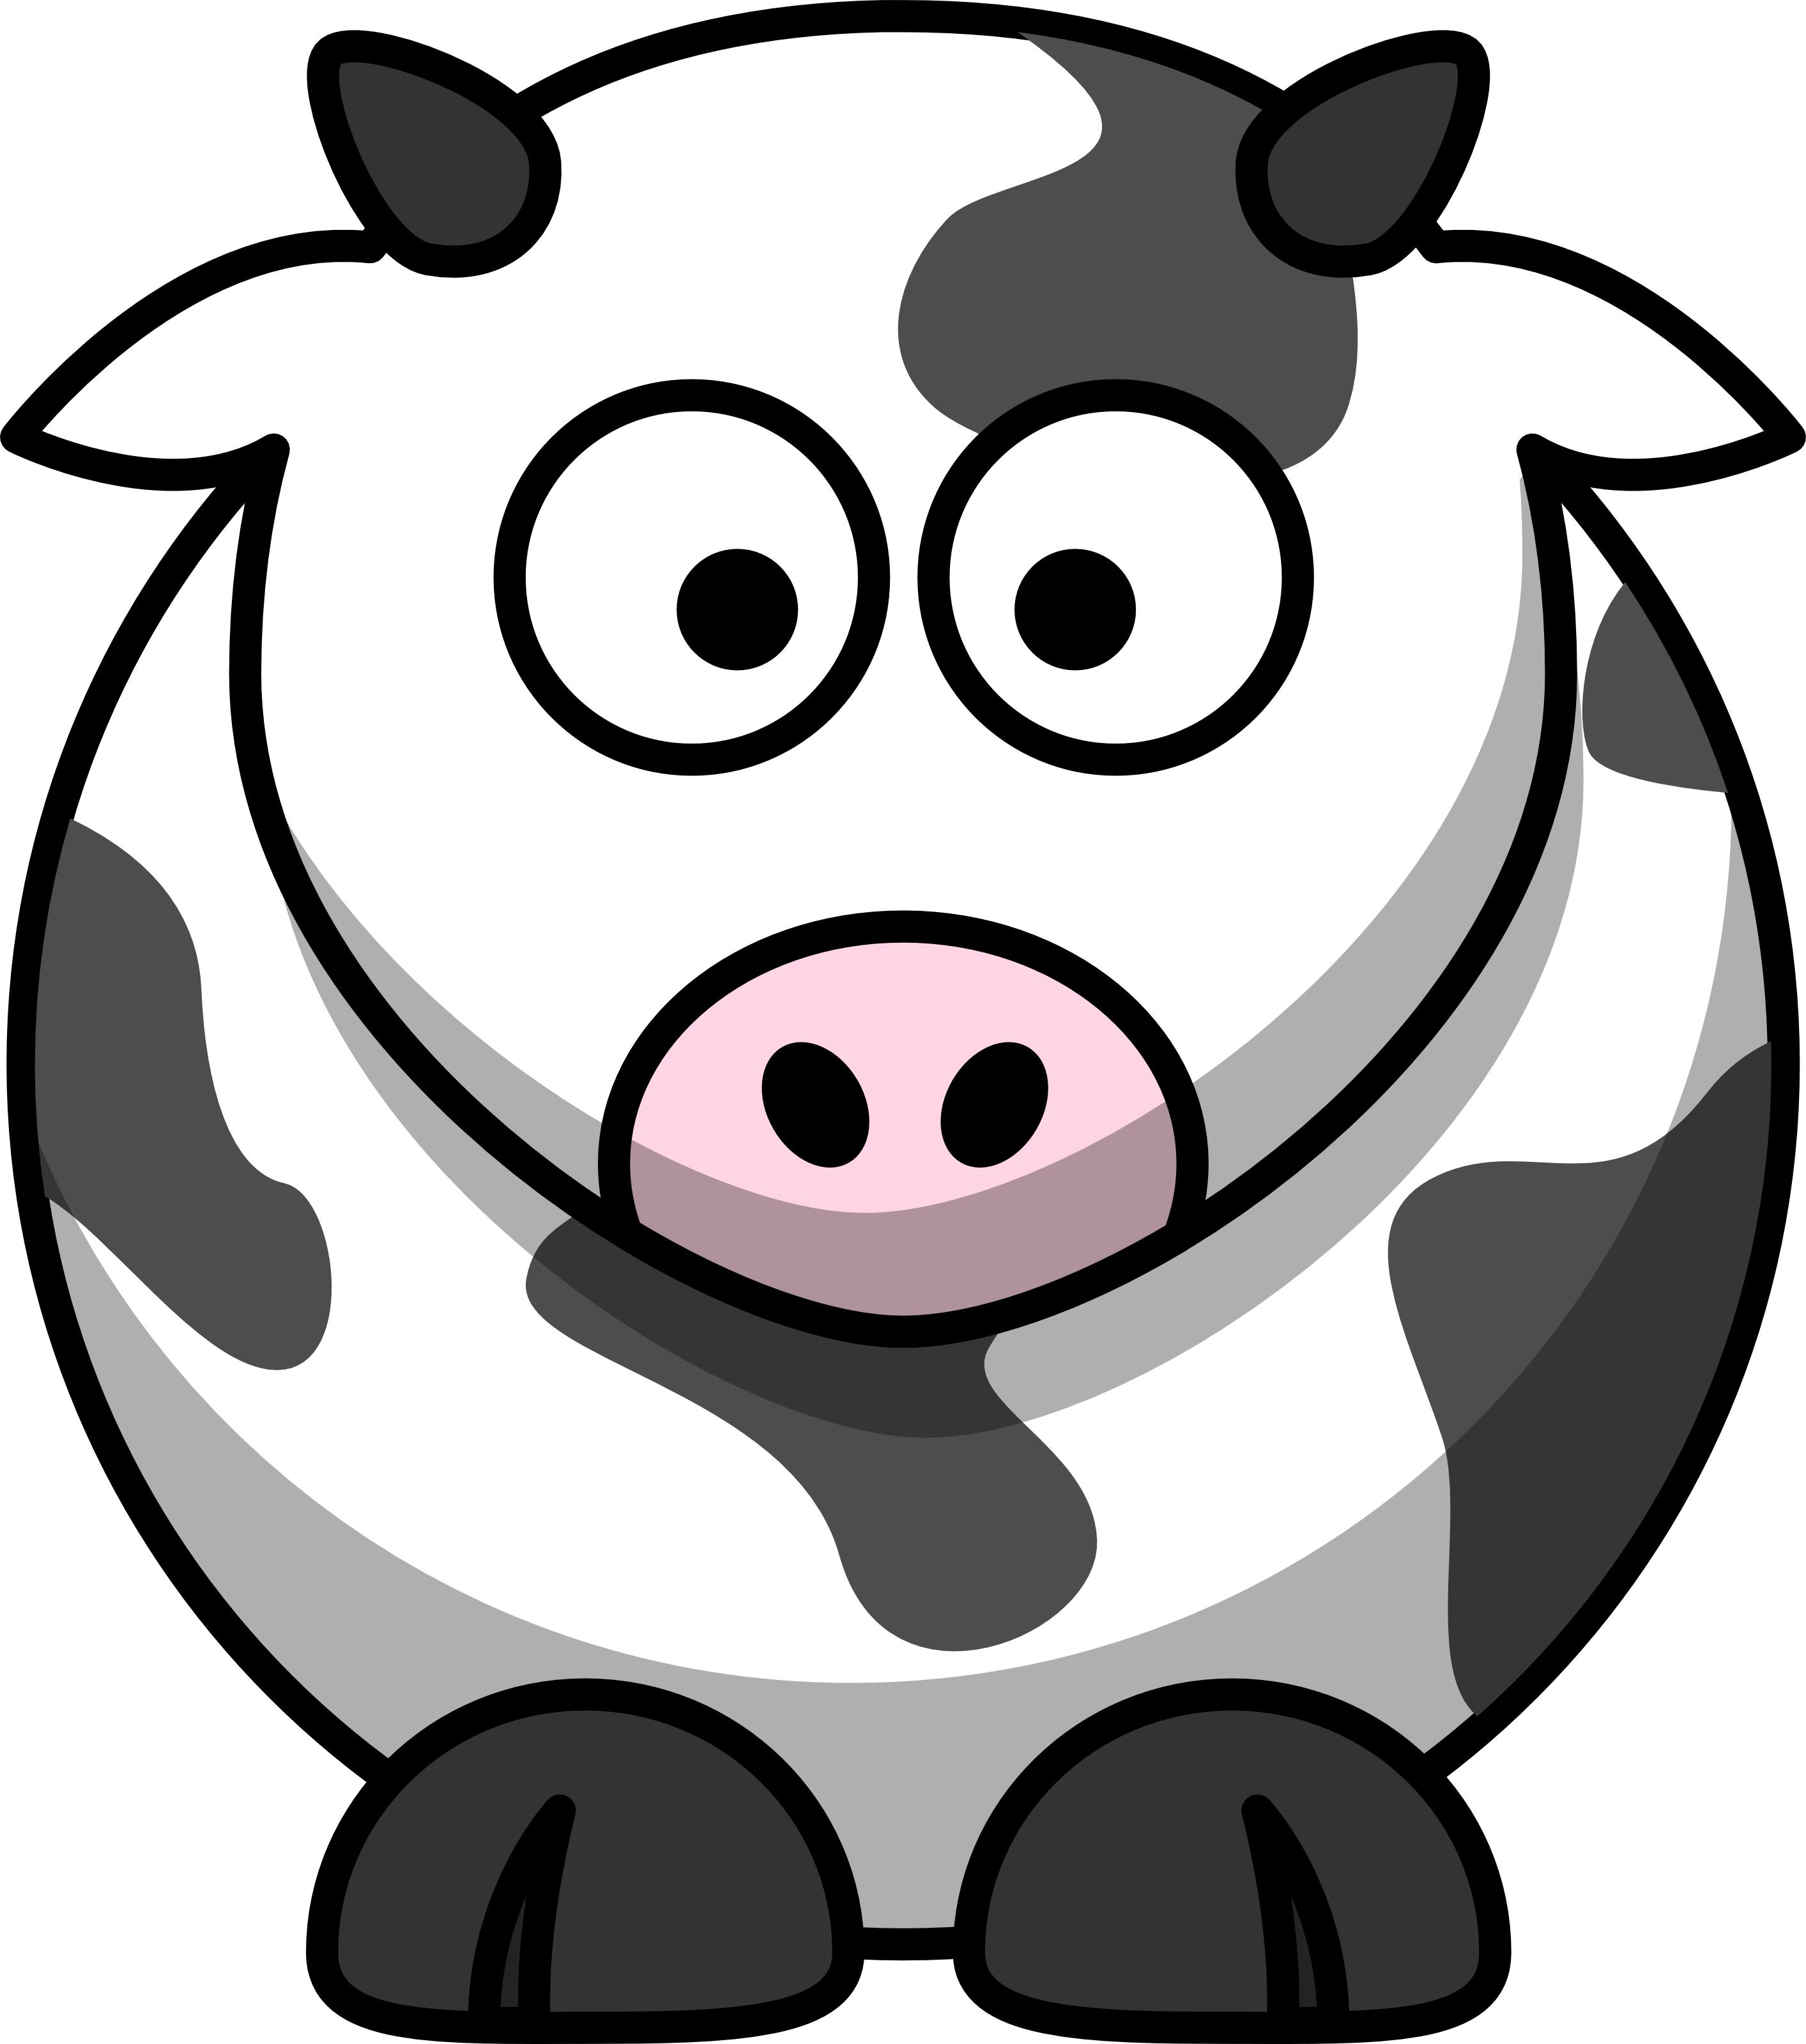 Cartoons clipart image 1 2 - Free Cartoon Clip Art